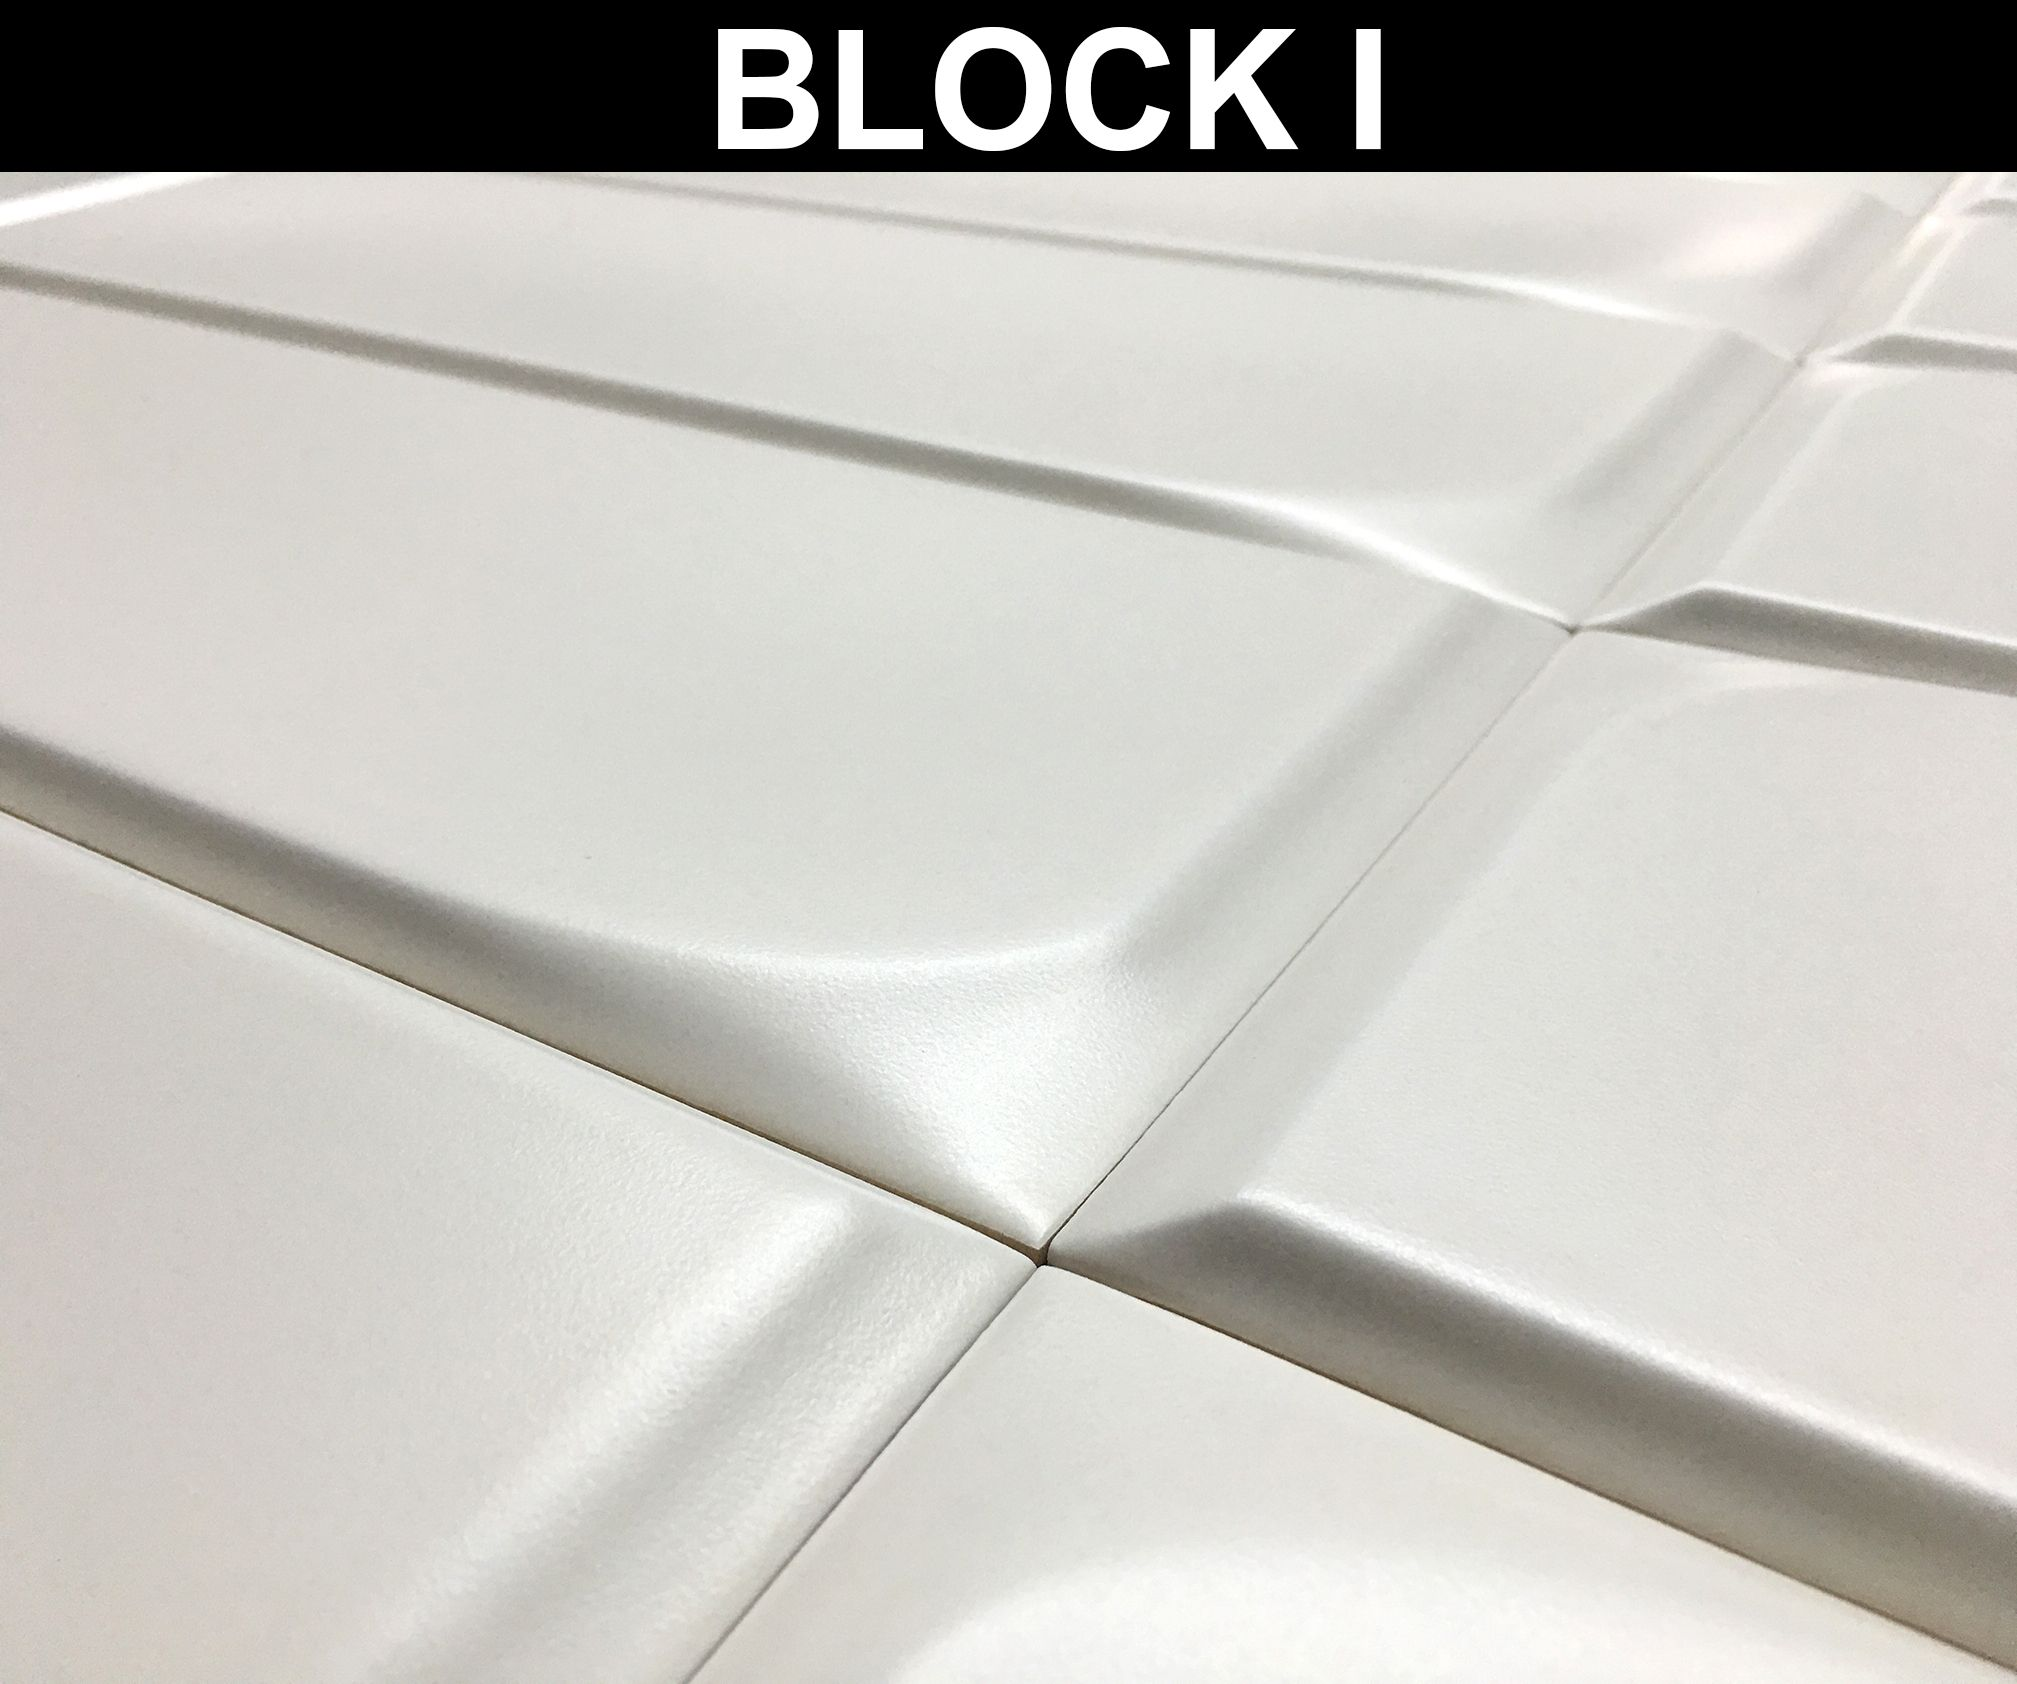 Detail Ceramic Relief 4 96 X 14 76 In Colours White Beige Brown Grey And Black Detalle Relieve Ceramico De 12 5 X 37 5 Cm En Azulejos Colores Modulares